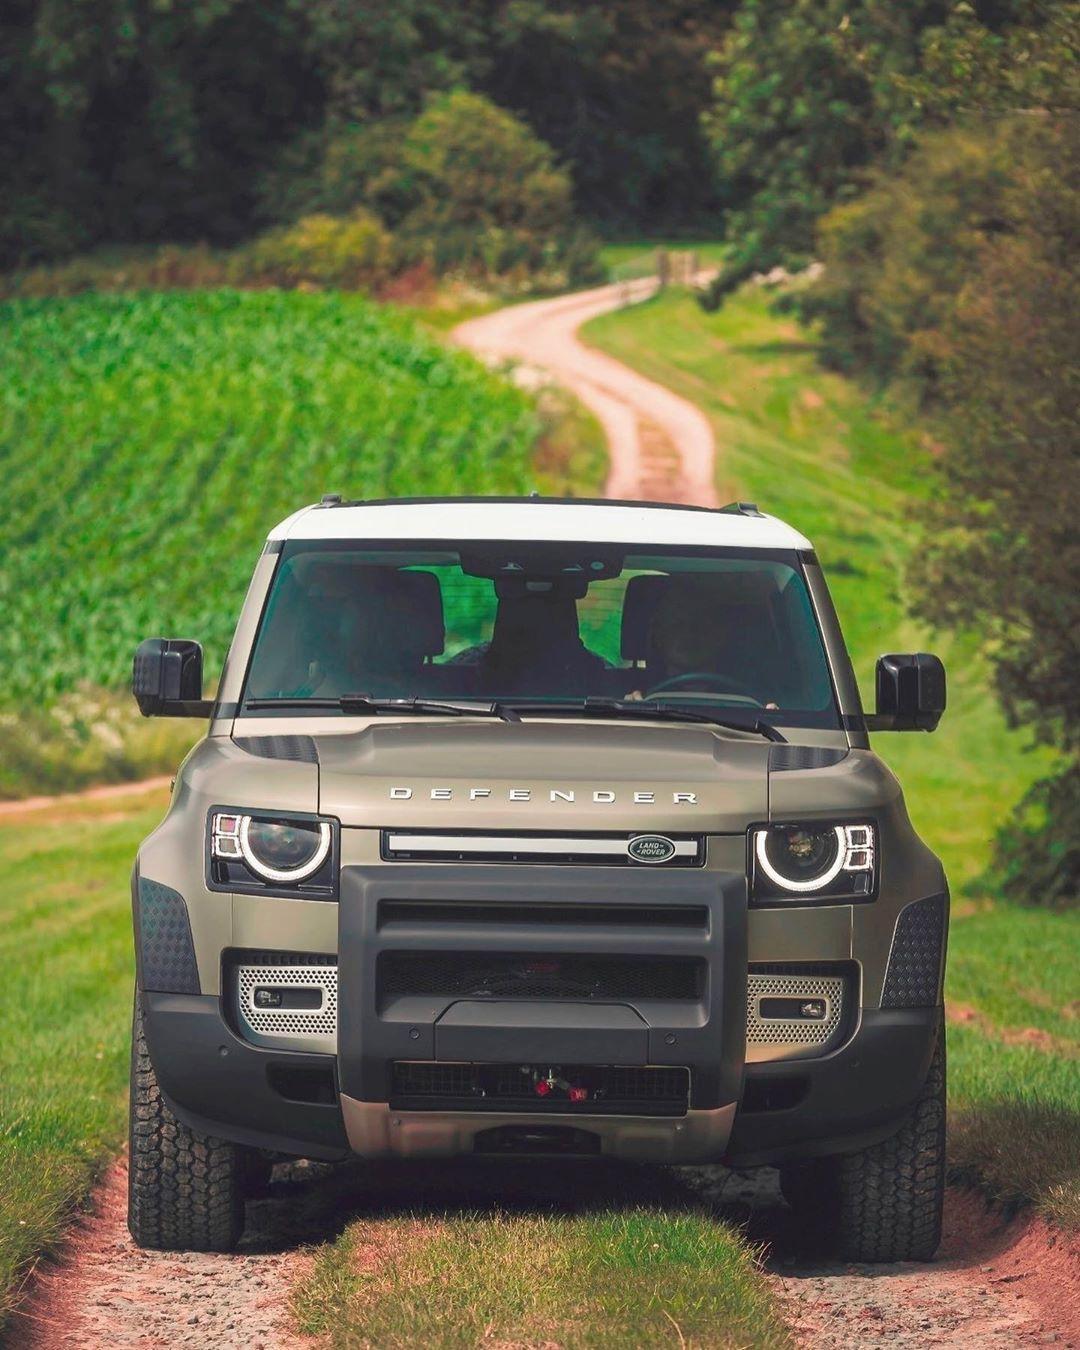 Land Rover Defender 2020 On Instagram What Size Wheels Should